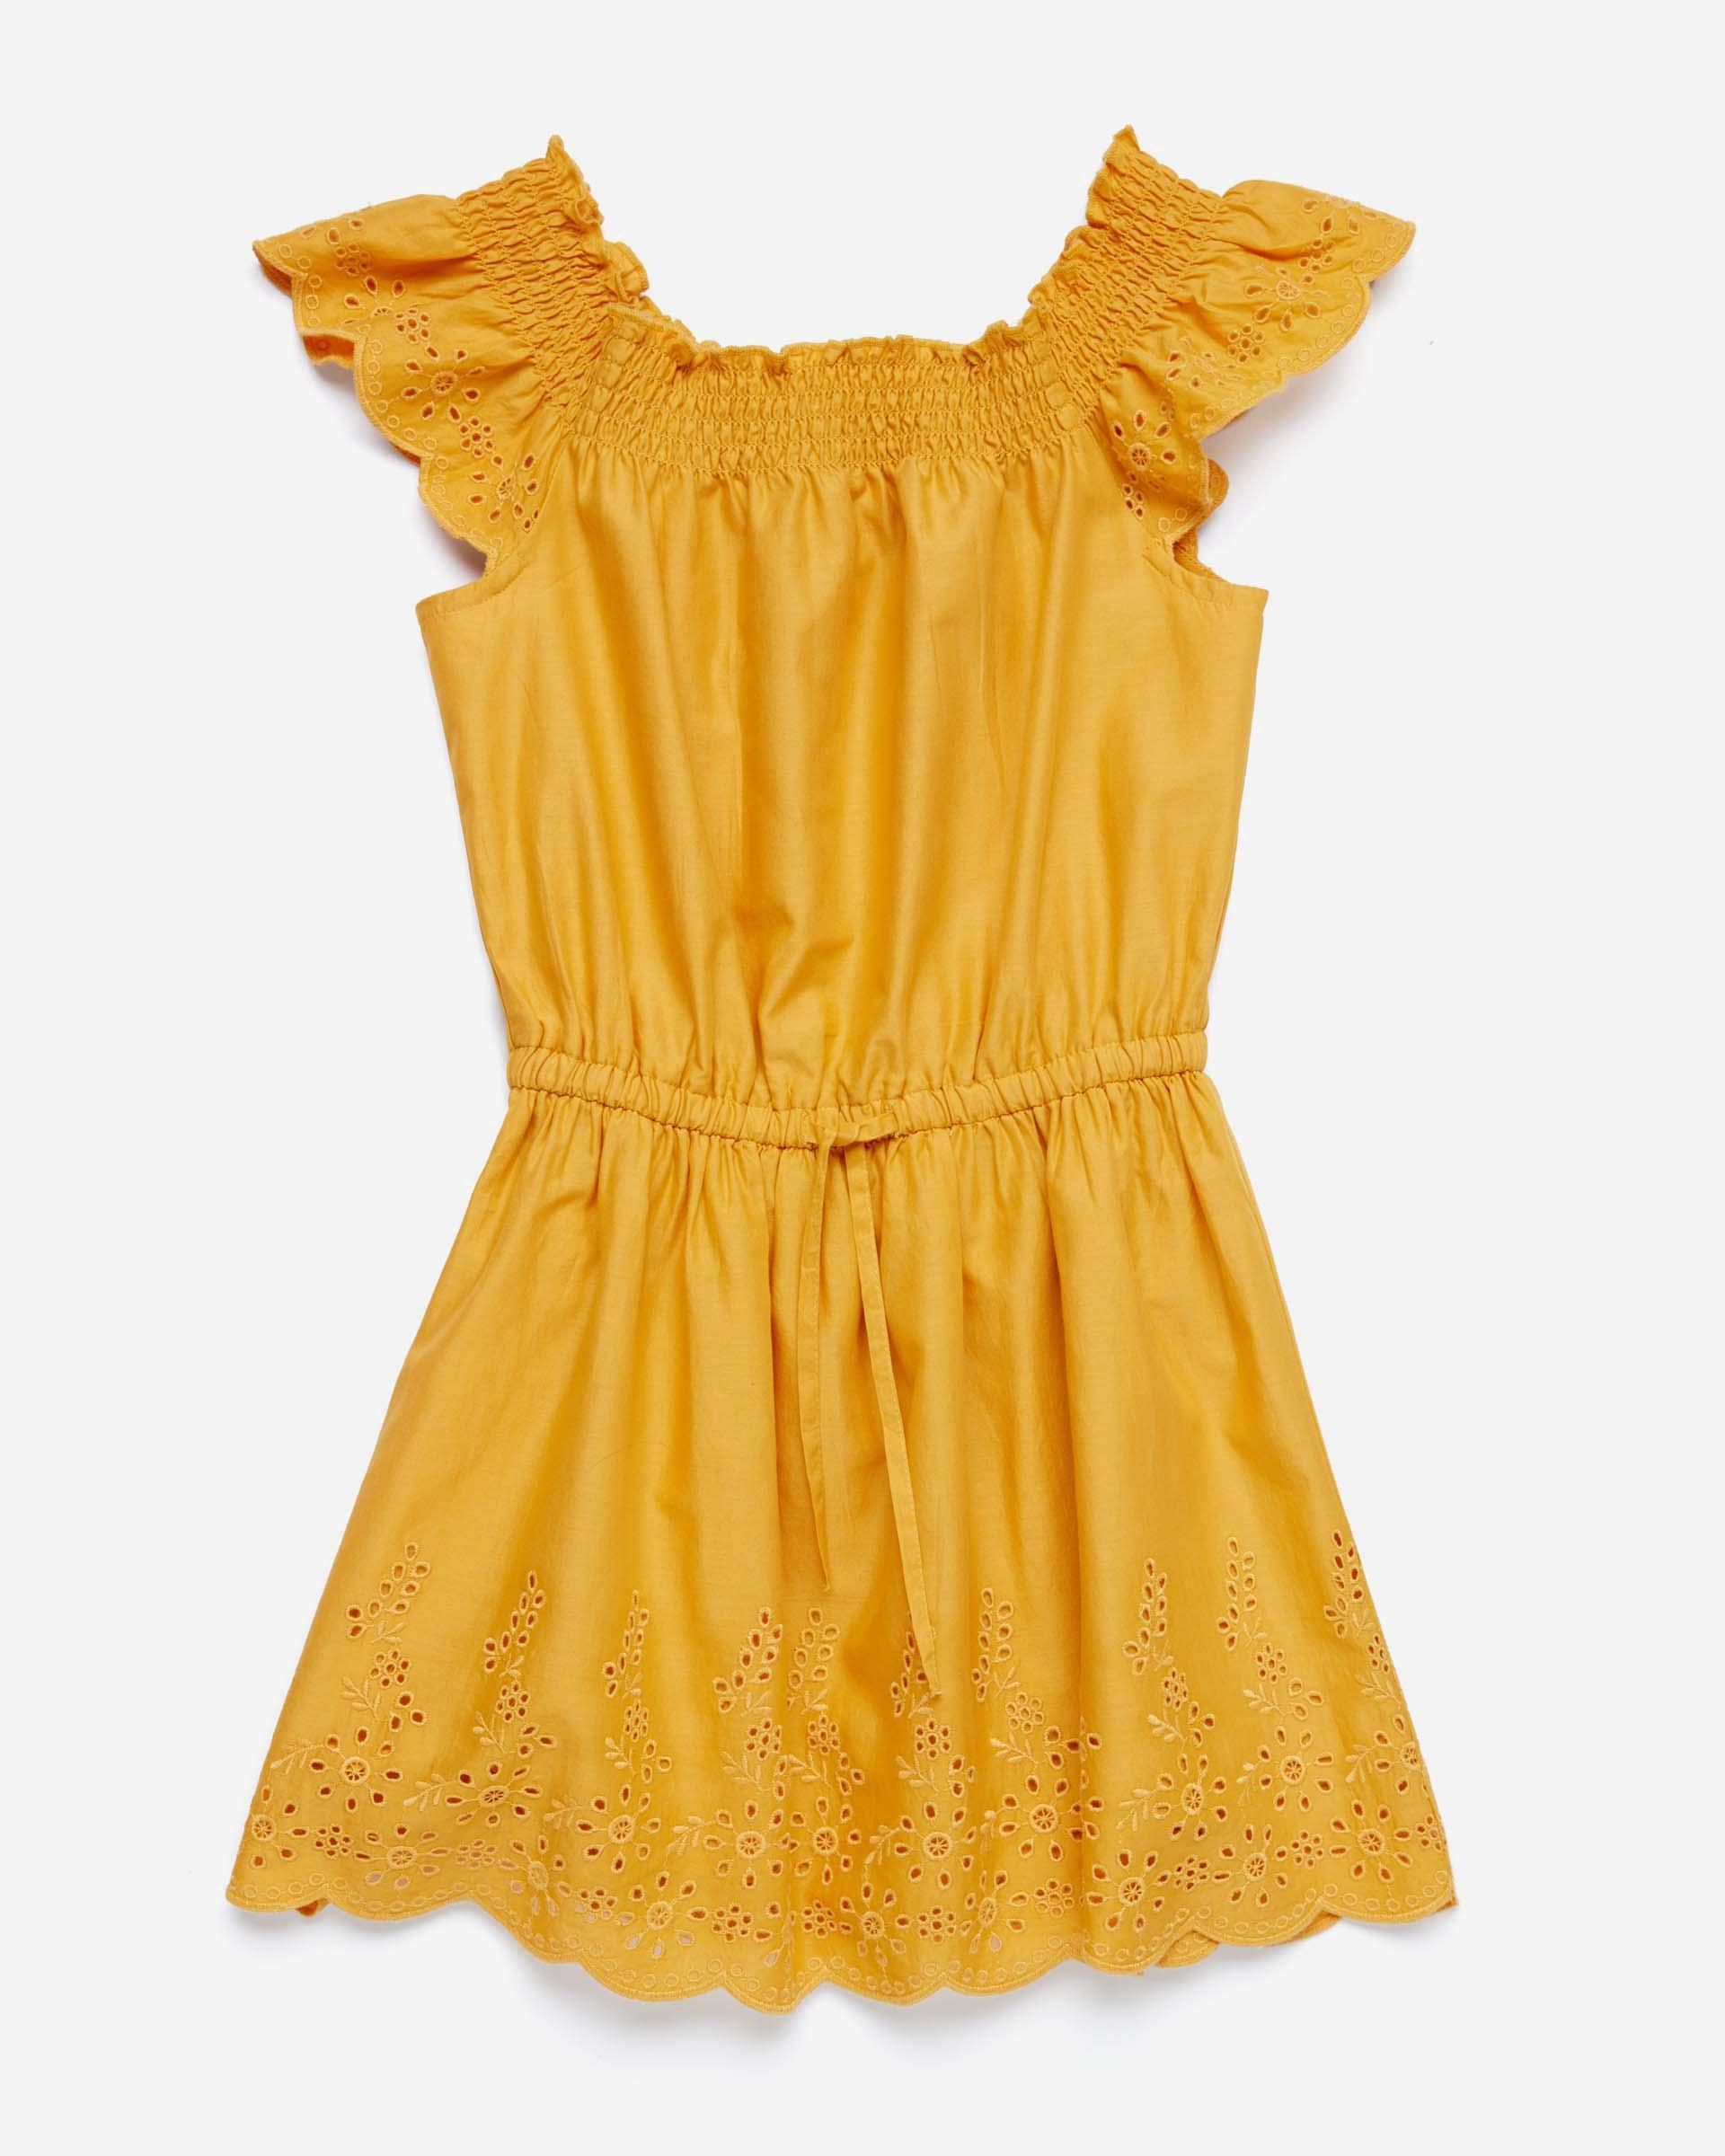 Купить 20P_4JO15VDK0_10K, Платье для девочек Benetton 4JO15VDK0_10K р-р 122, United Colors of Benetton, Платья для девочек